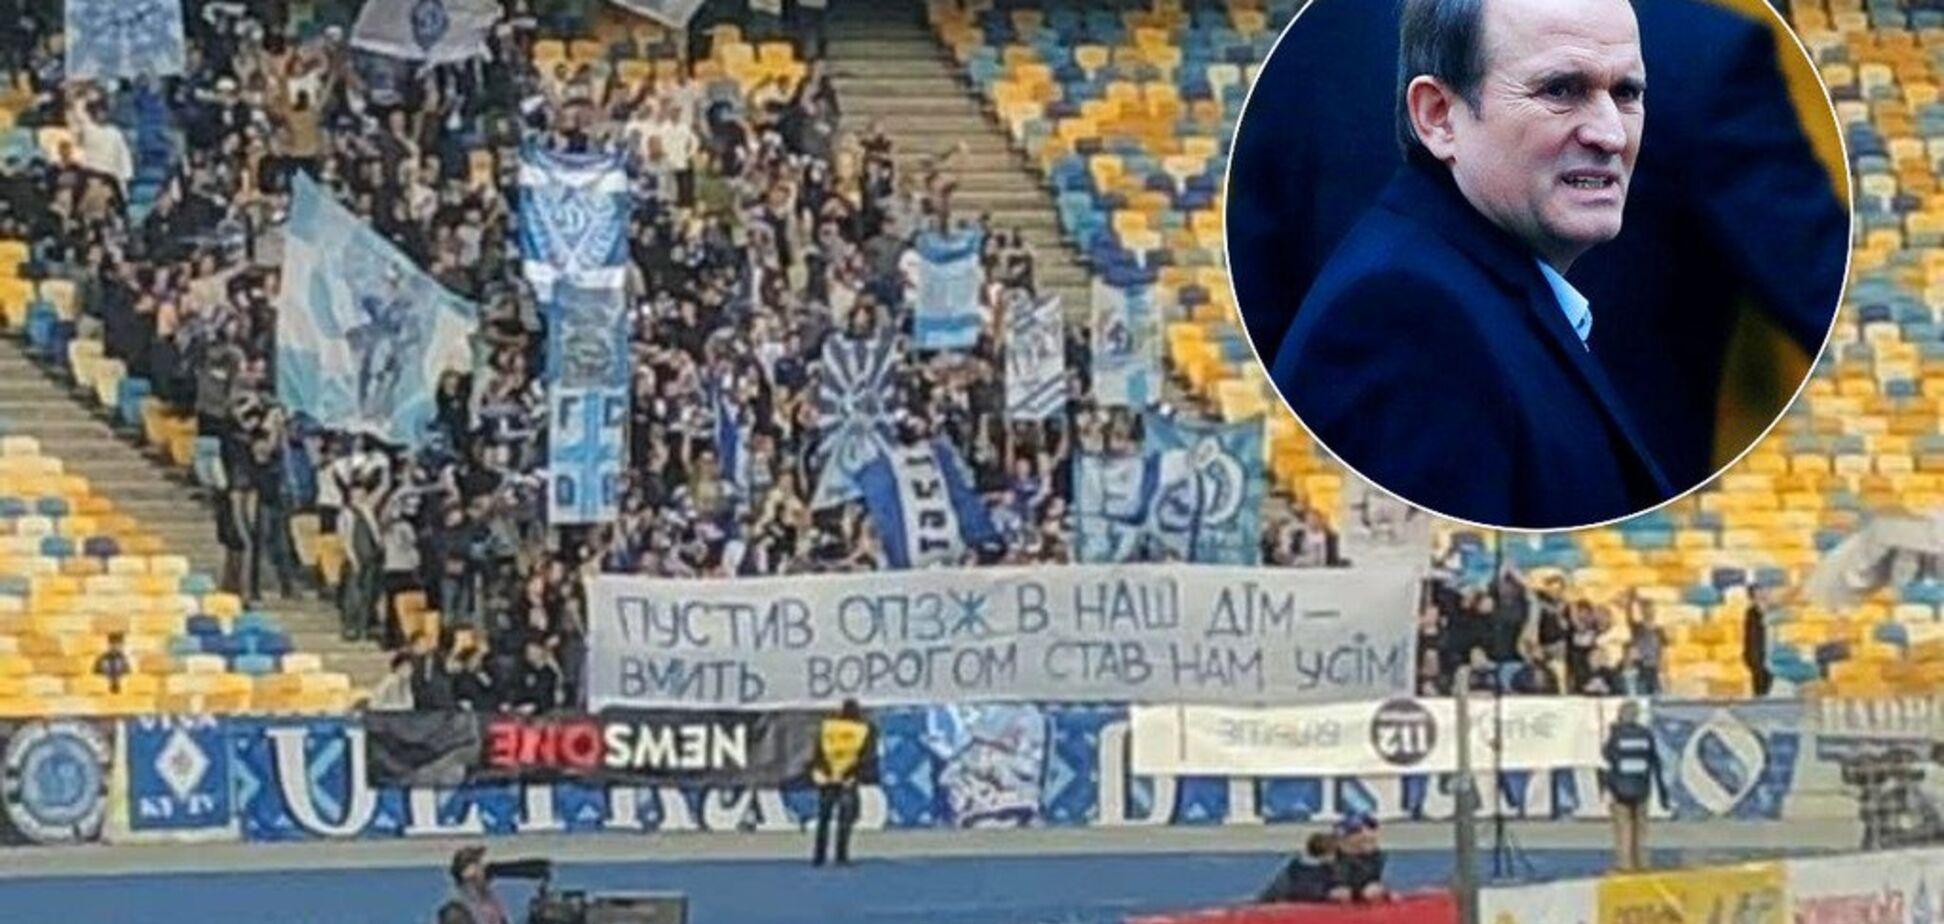 Фаны 'Динамо' отомстили Медведчуку - опубликовано видео